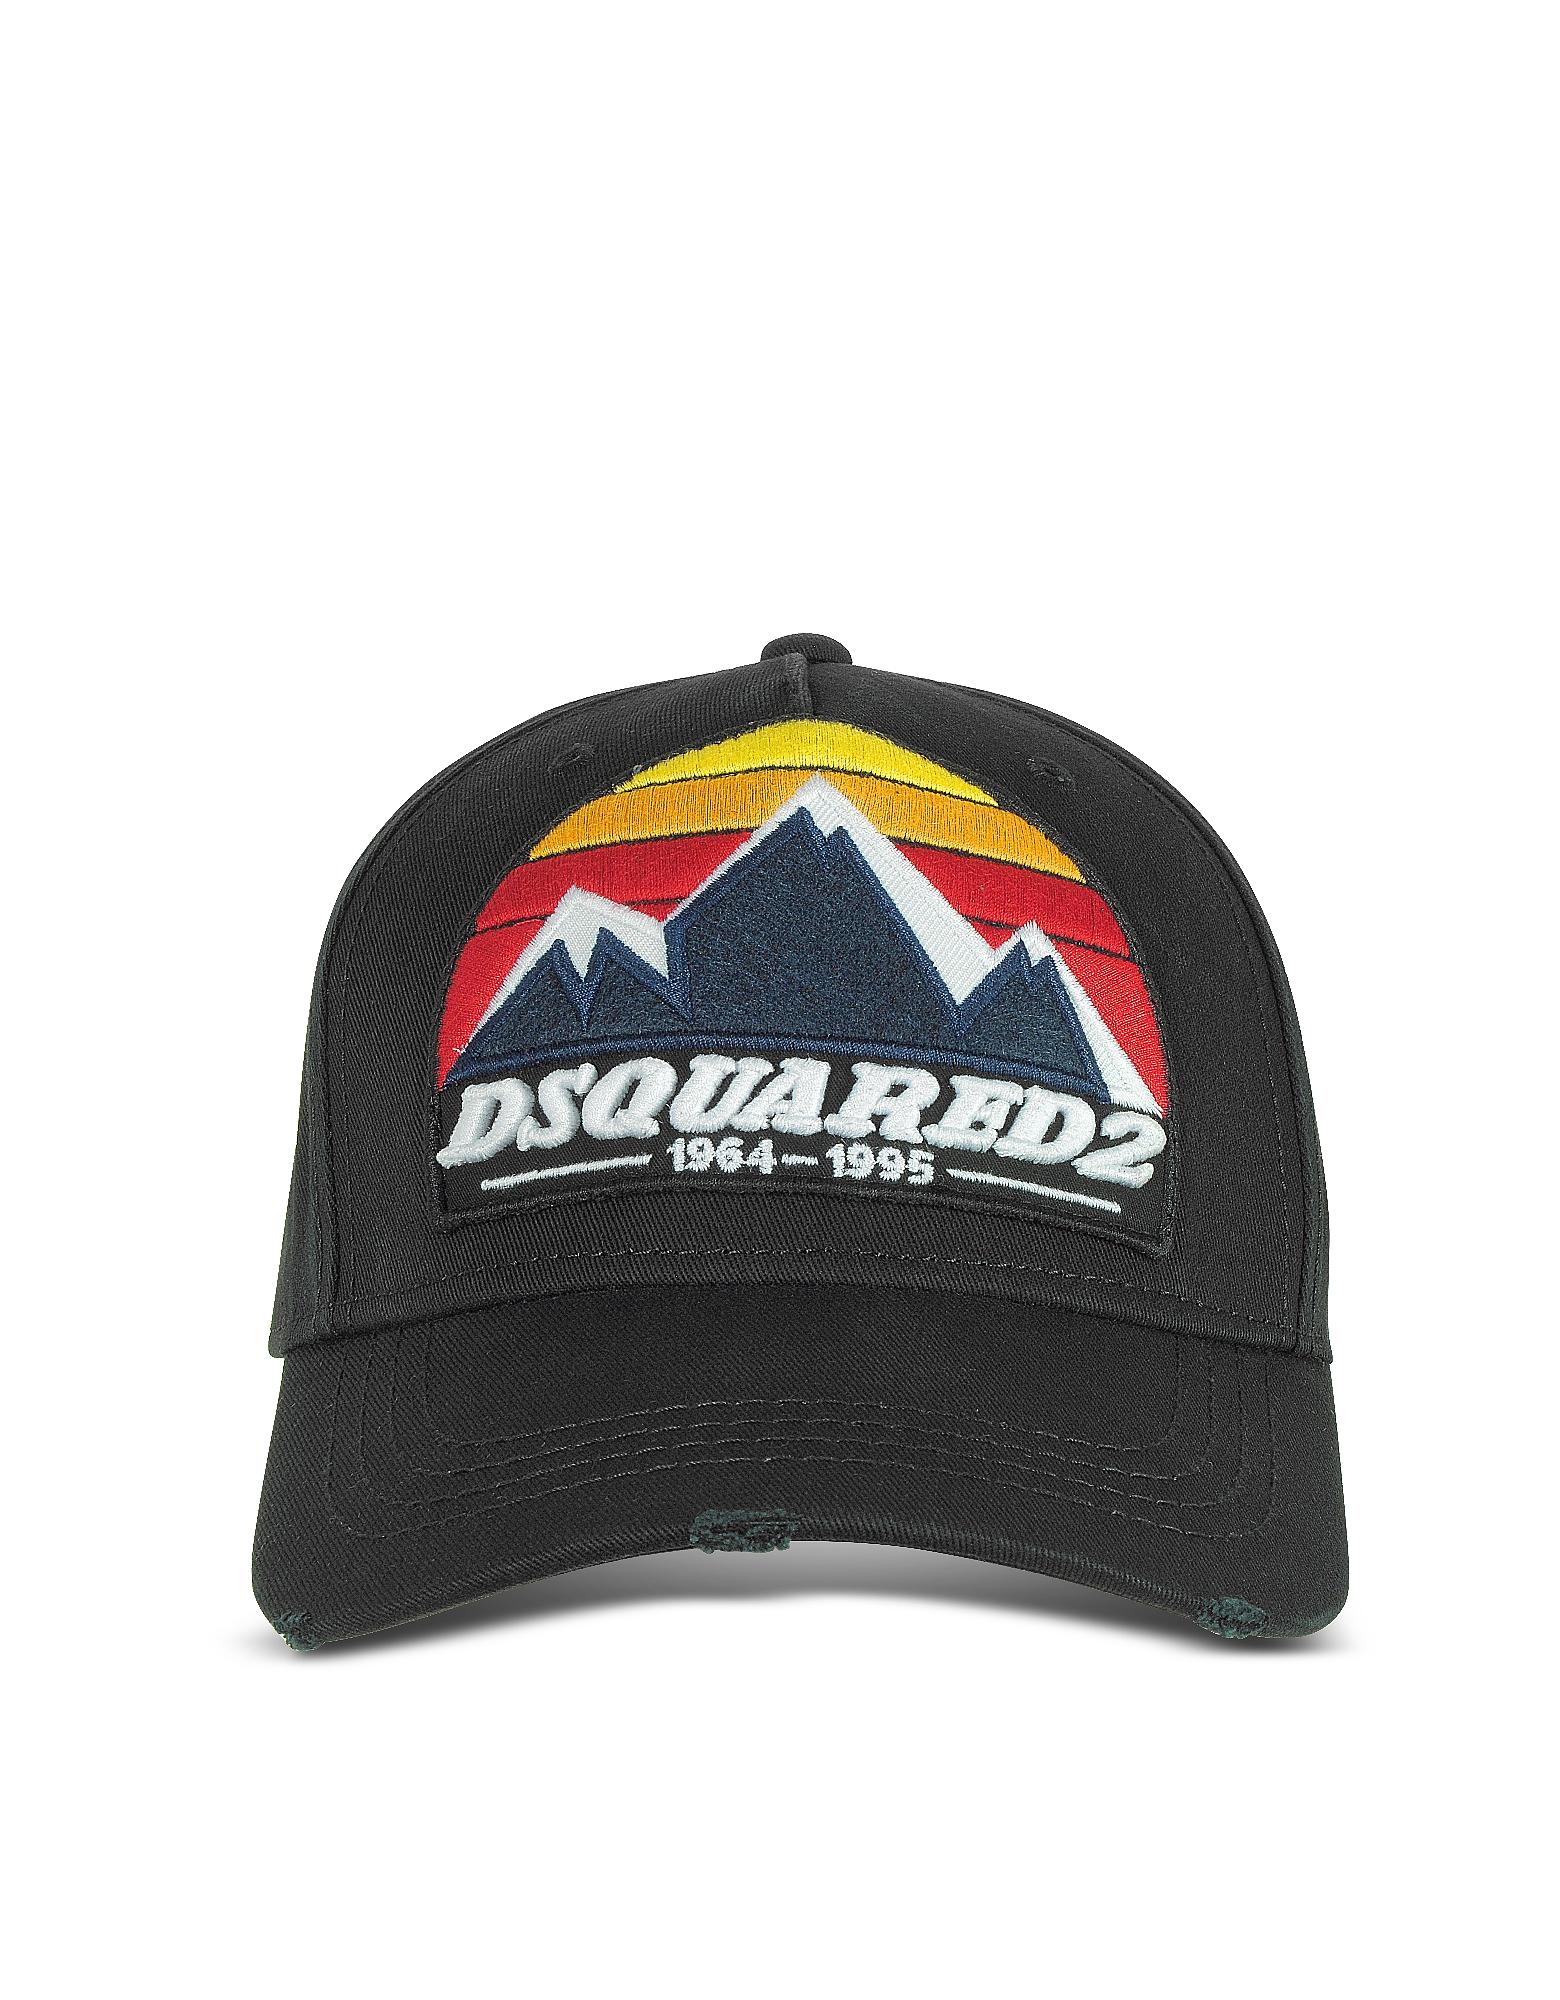 D2 Mountain - Черная Габардиновая Бейсболка